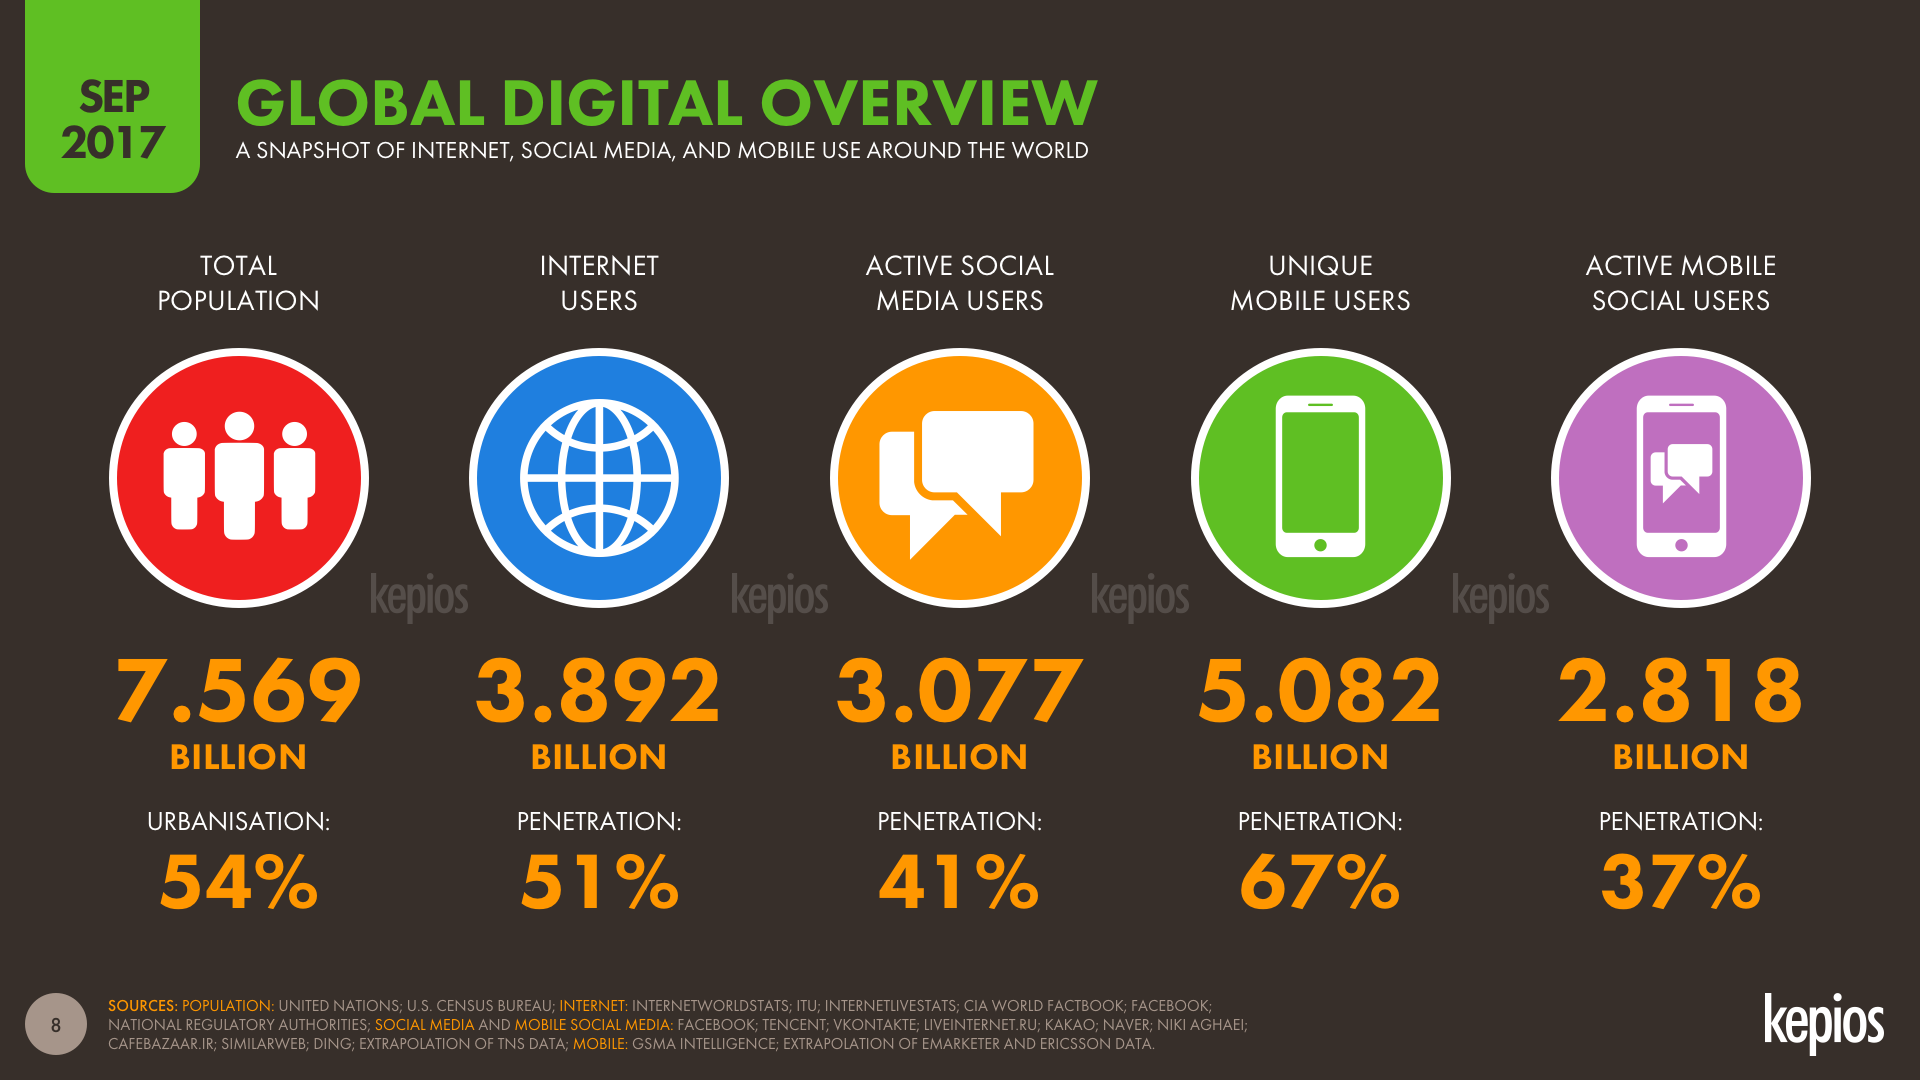 Global Digital Snapshot, Sep 2017